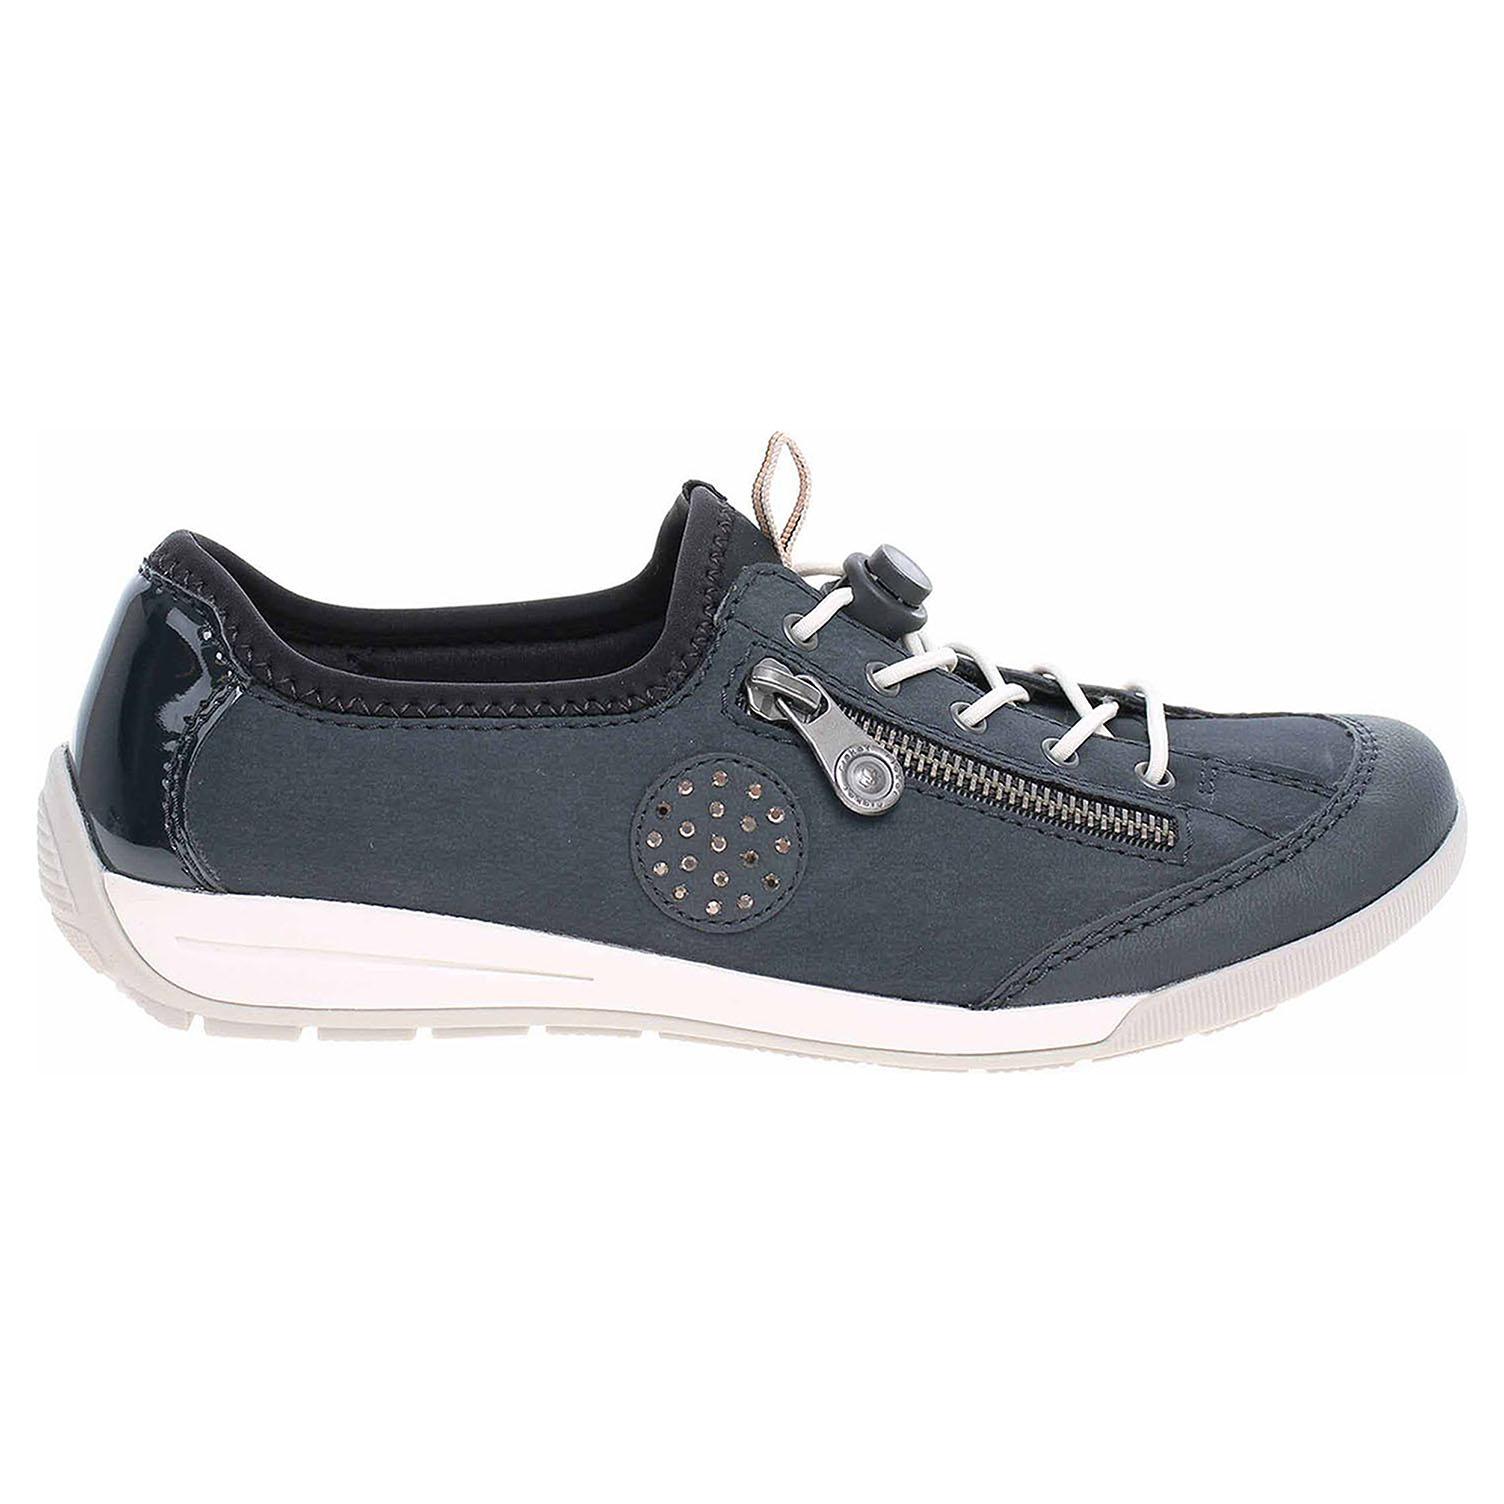 8b0d337f52a Ecco Rieker dámská obuv M3063-15 blau 23200910